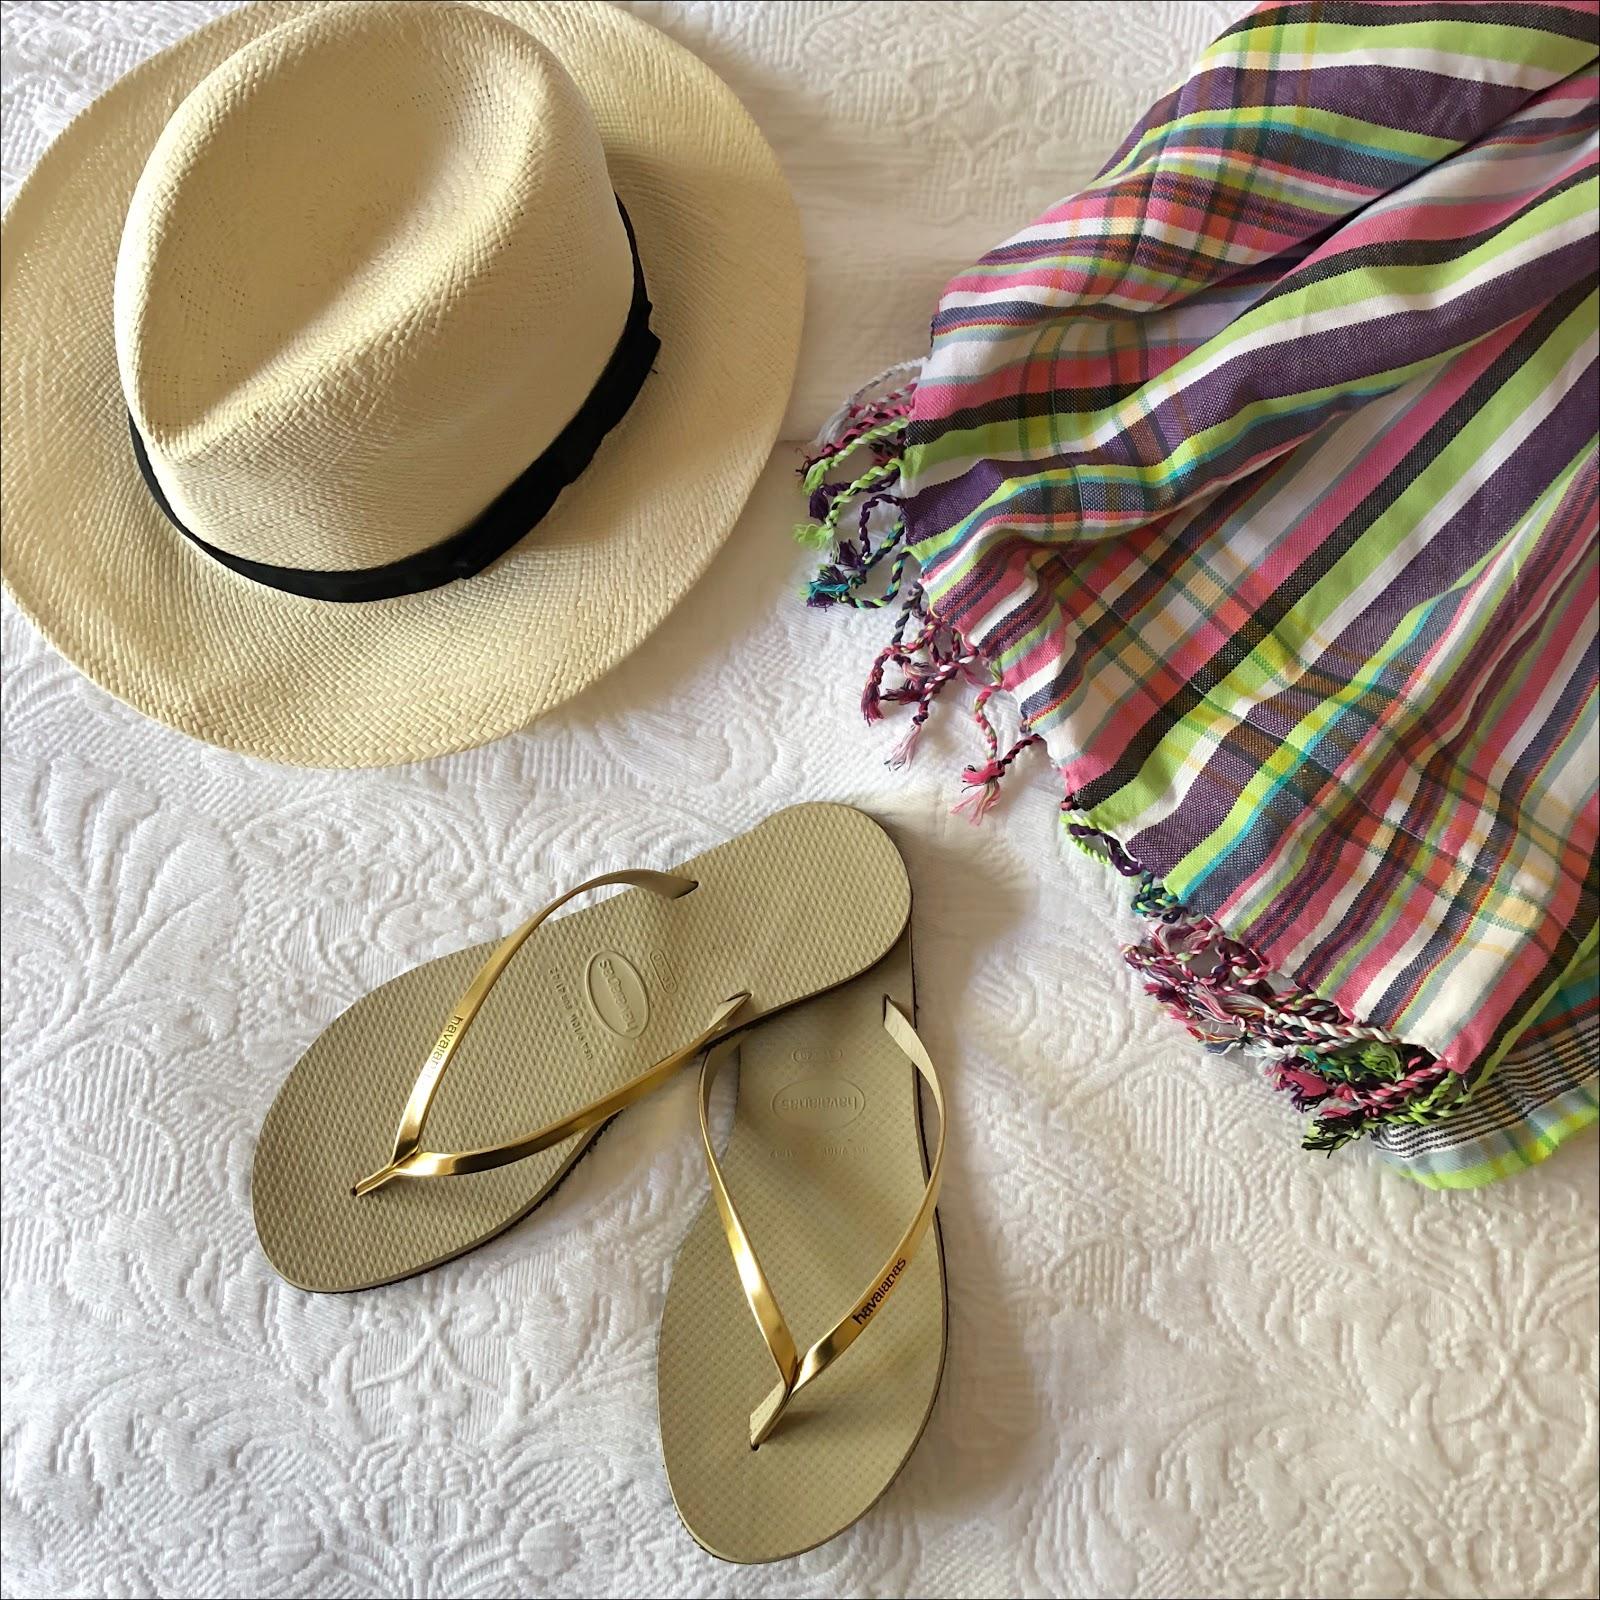 my midlife fashion, marks and spencer handwoven panama hat, kikoy beach towel, havaianas light gold you metallic flip flops